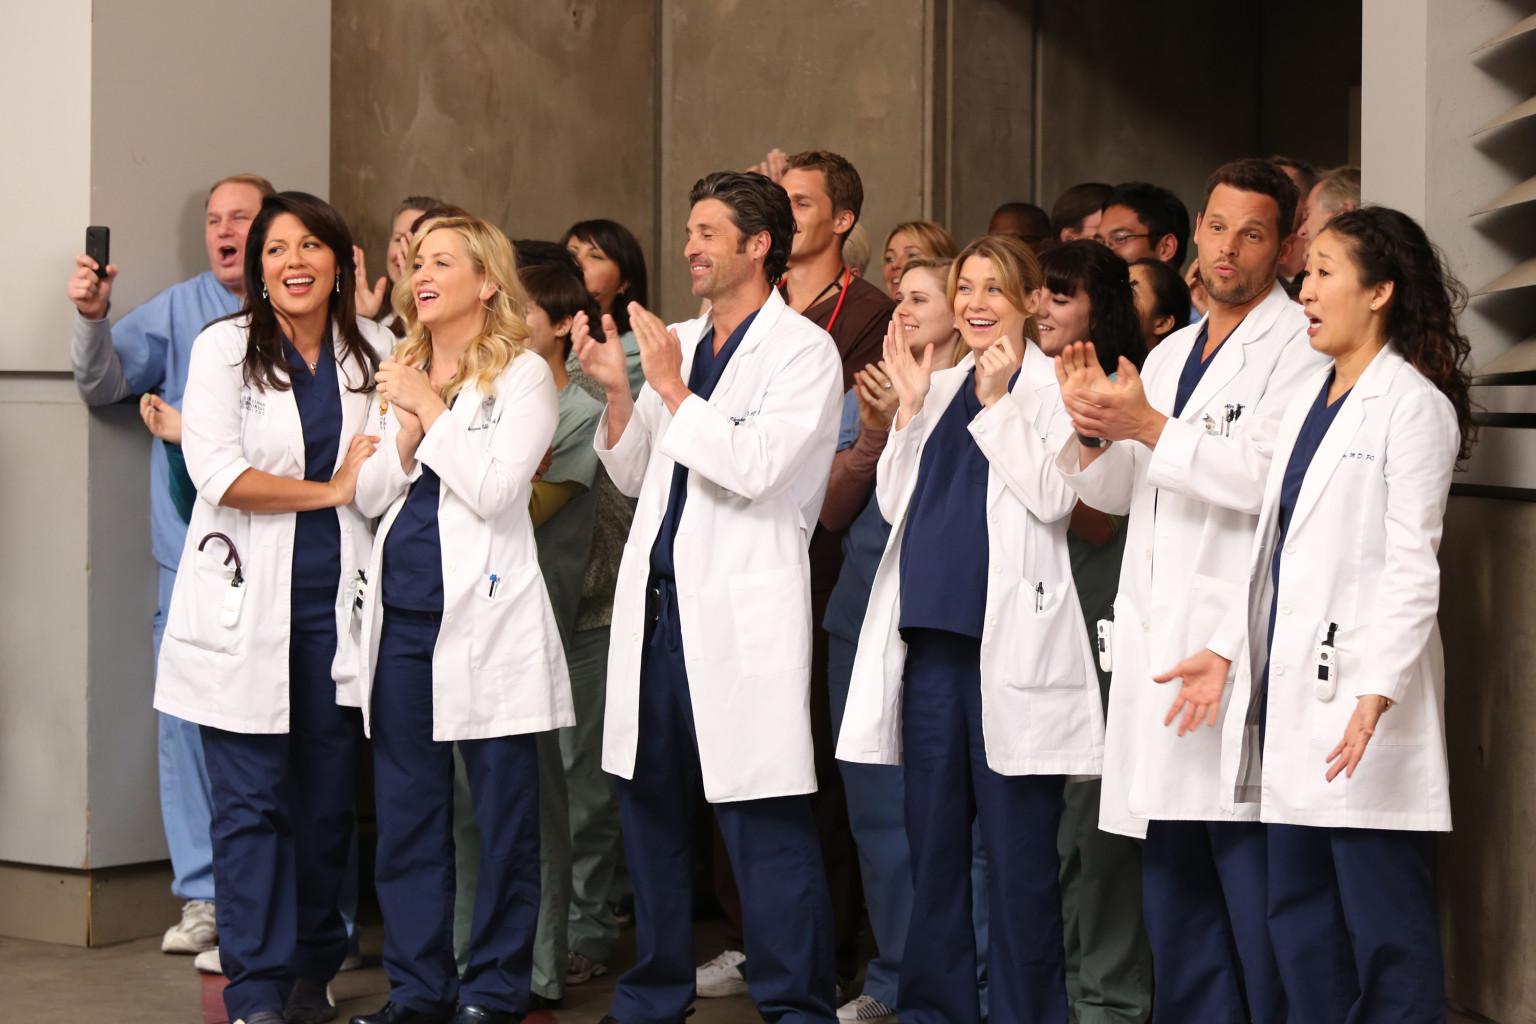 Greys Anatomy Episode